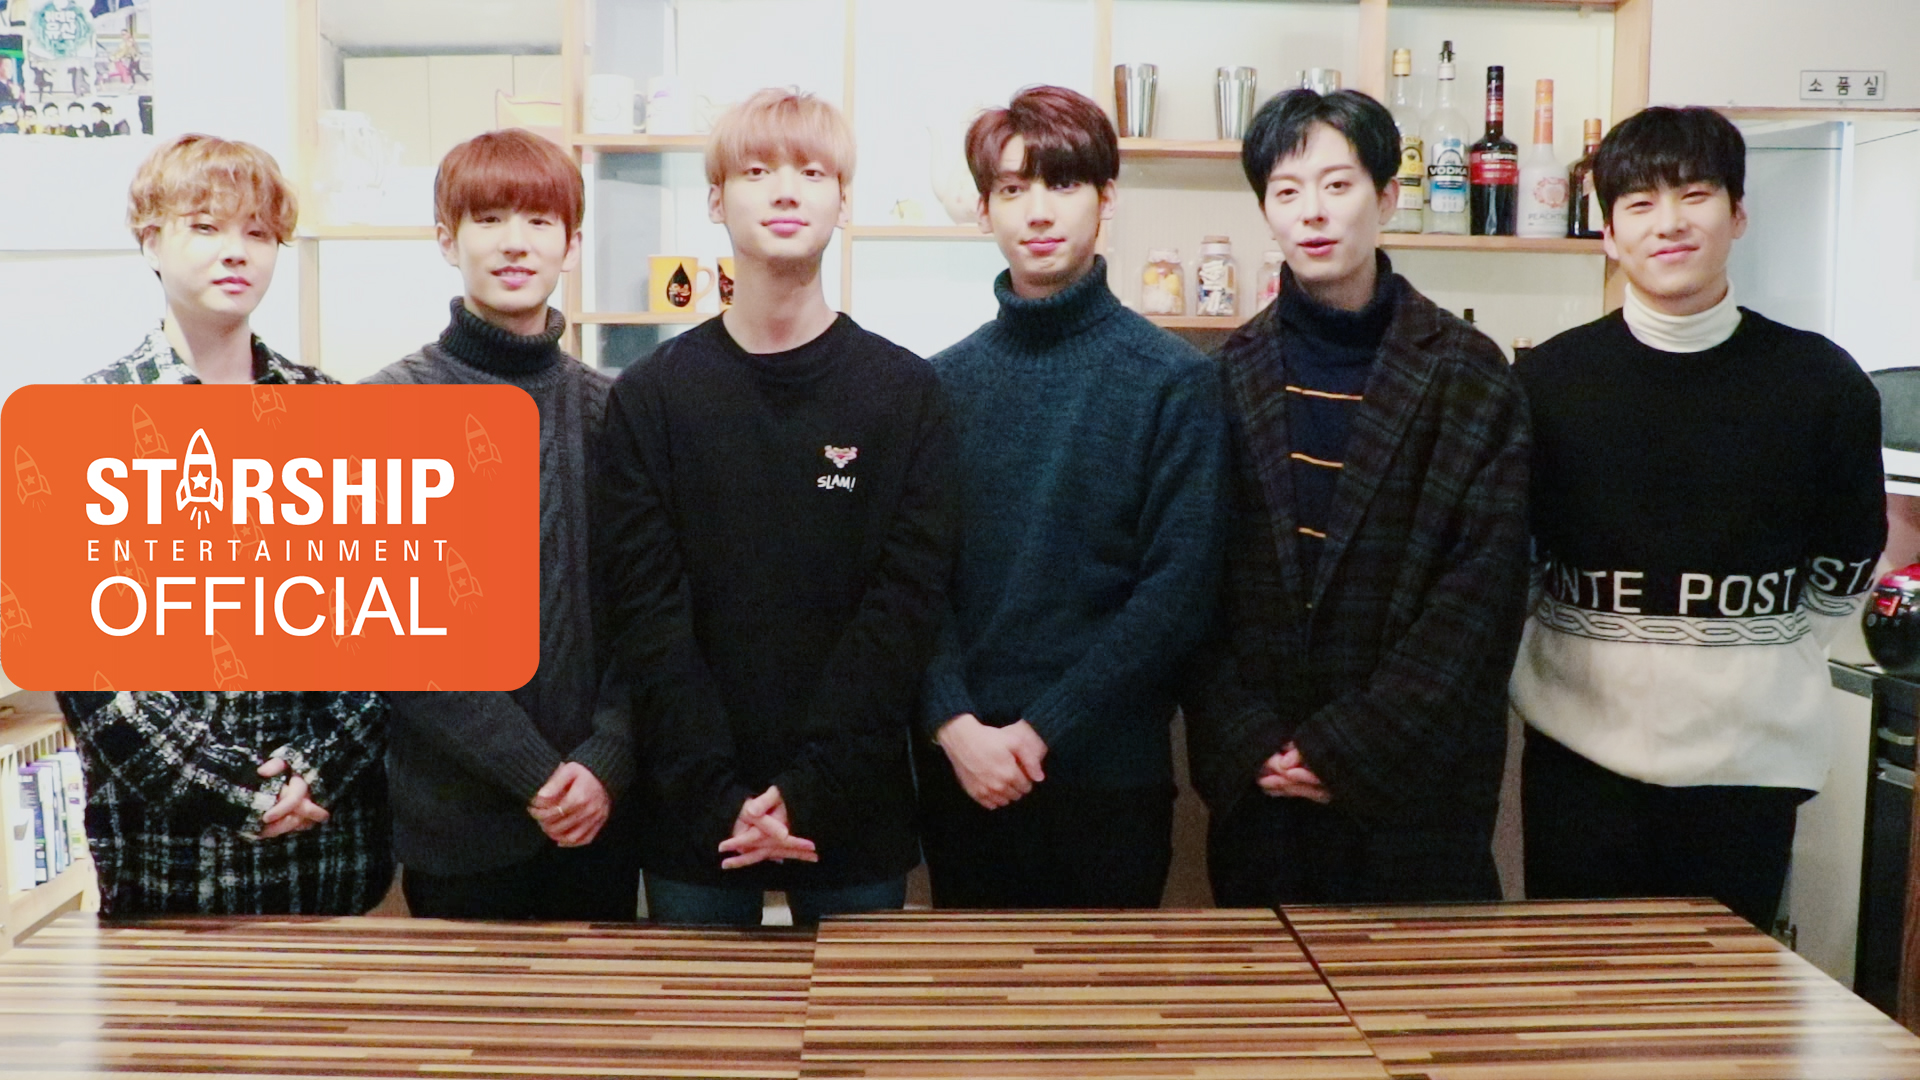 [Special Clip] 보이프렌드(BOYFRIEND) - 2018 설날인사 (2018 New Year's Greetings)